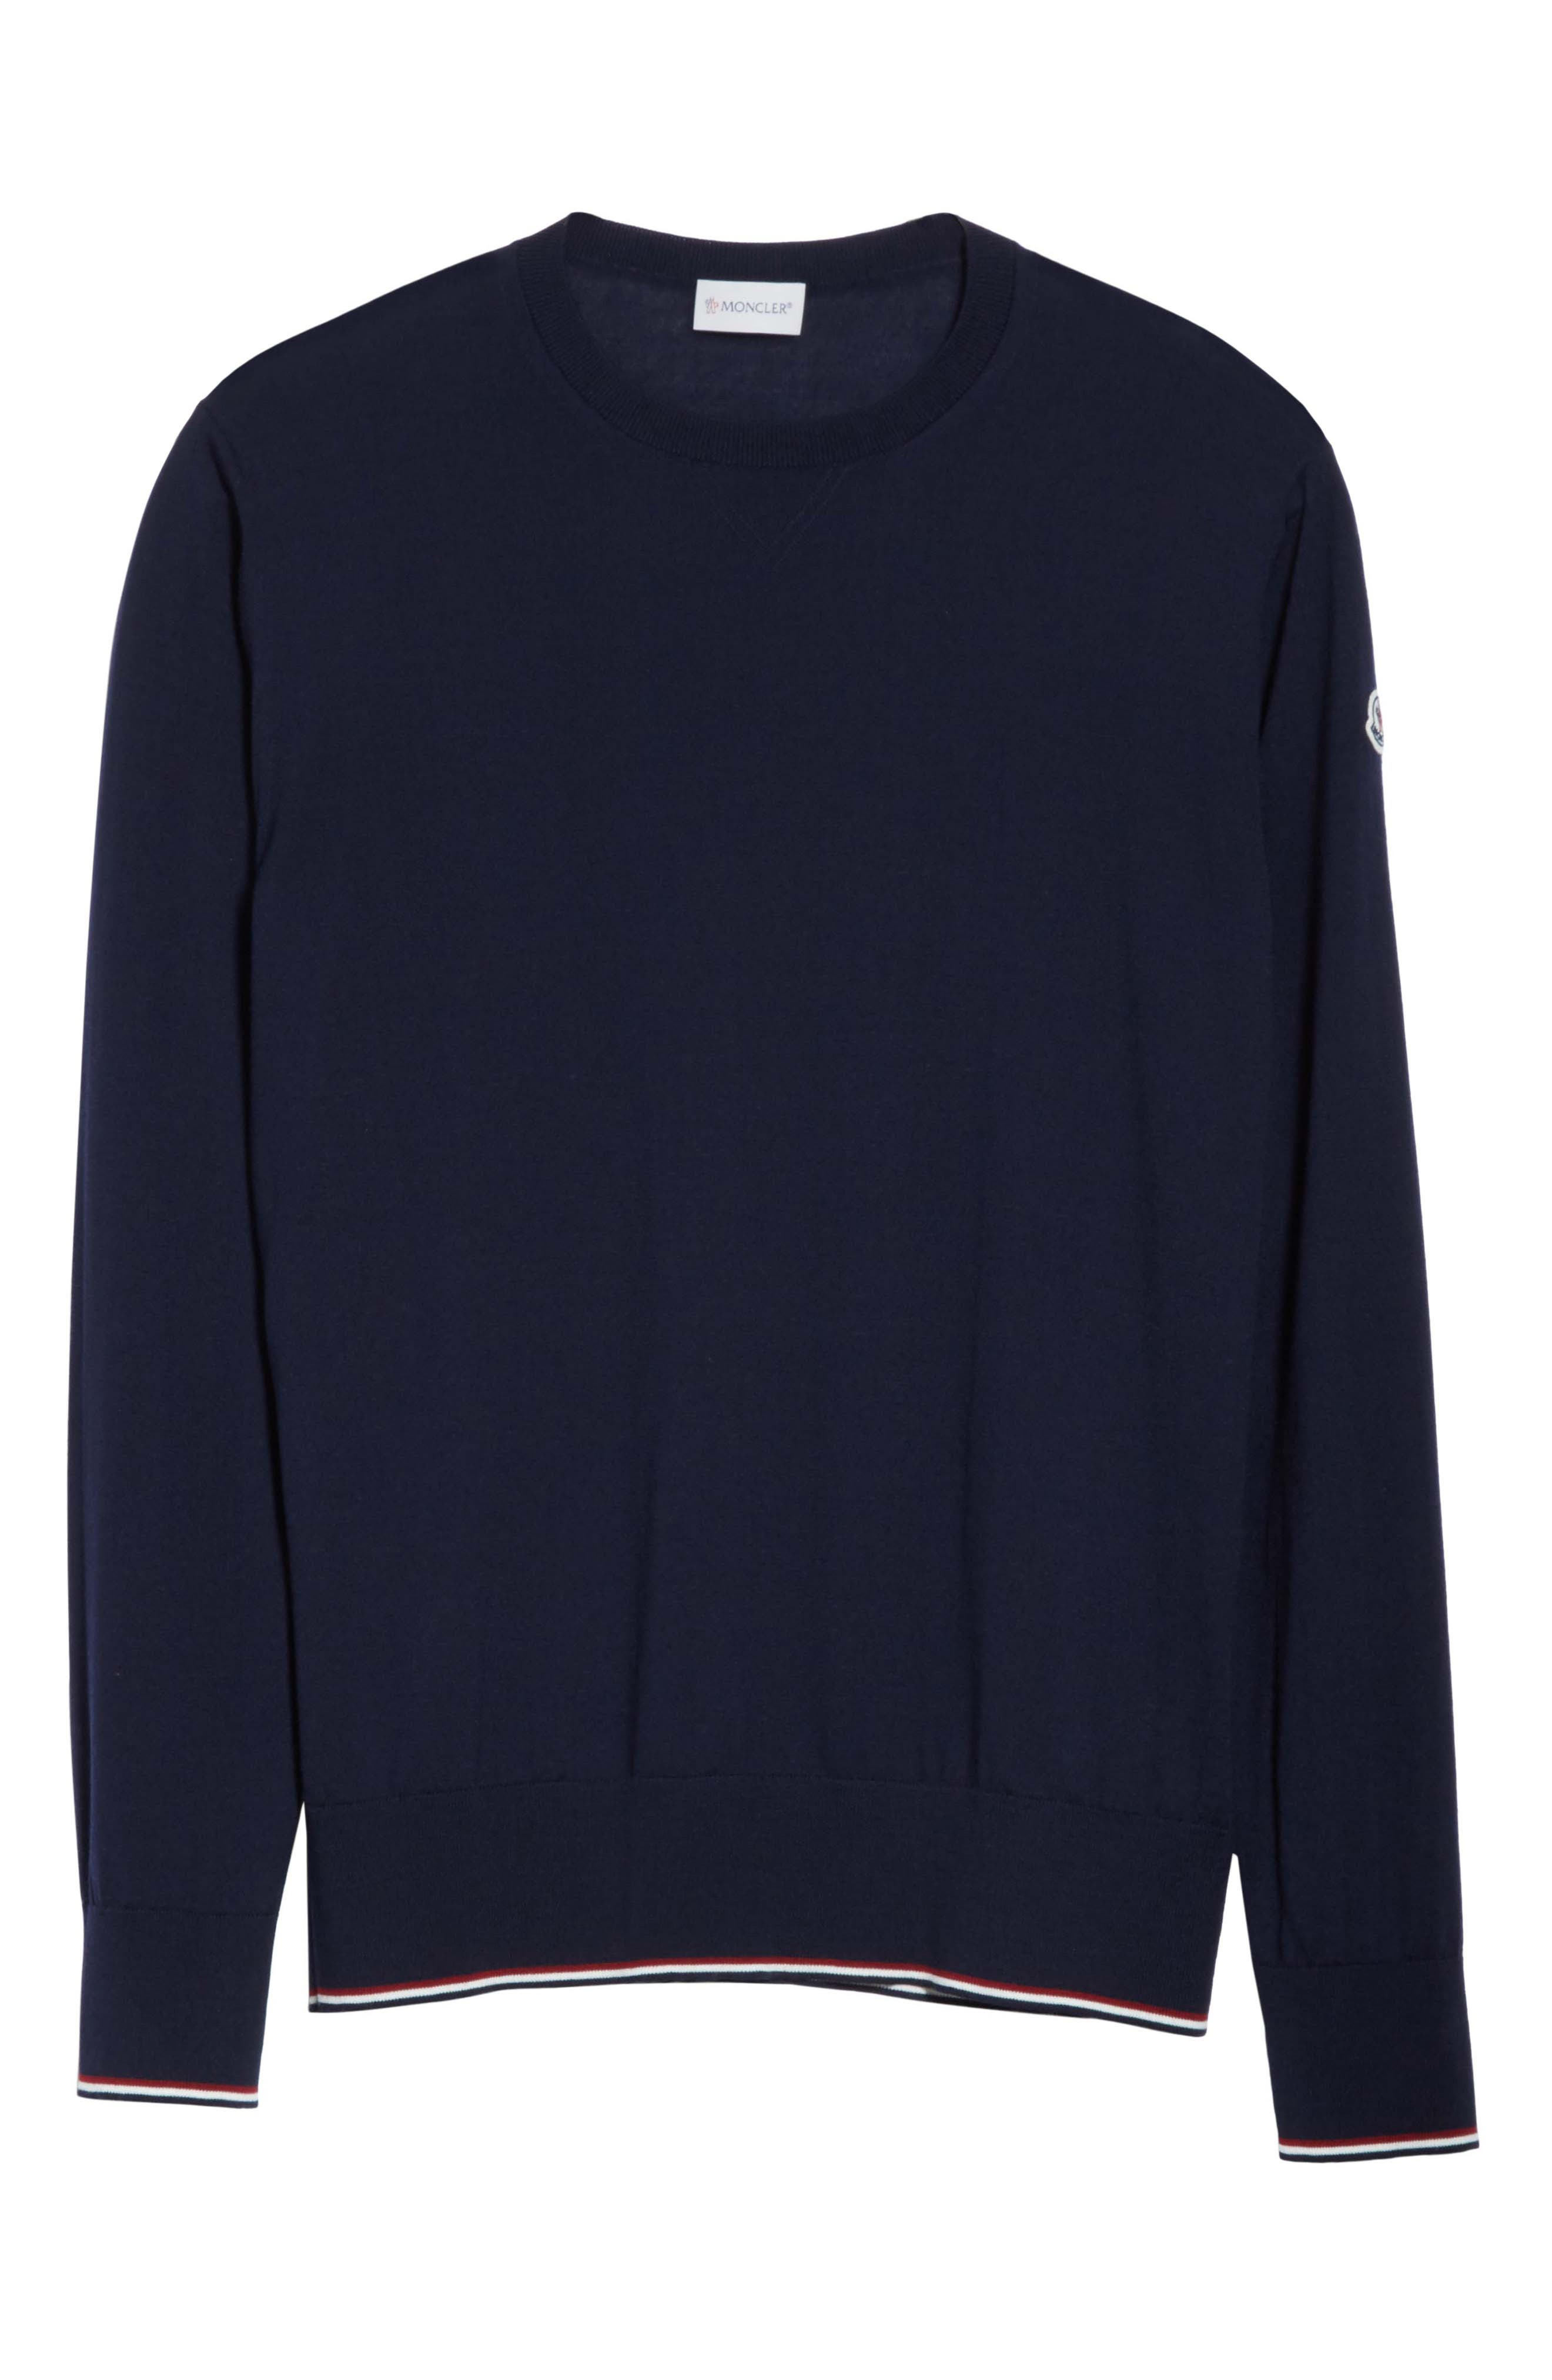 Virgin Wool Crewneck Sweater,                             Alternate thumbnail 6, color,                             Navy